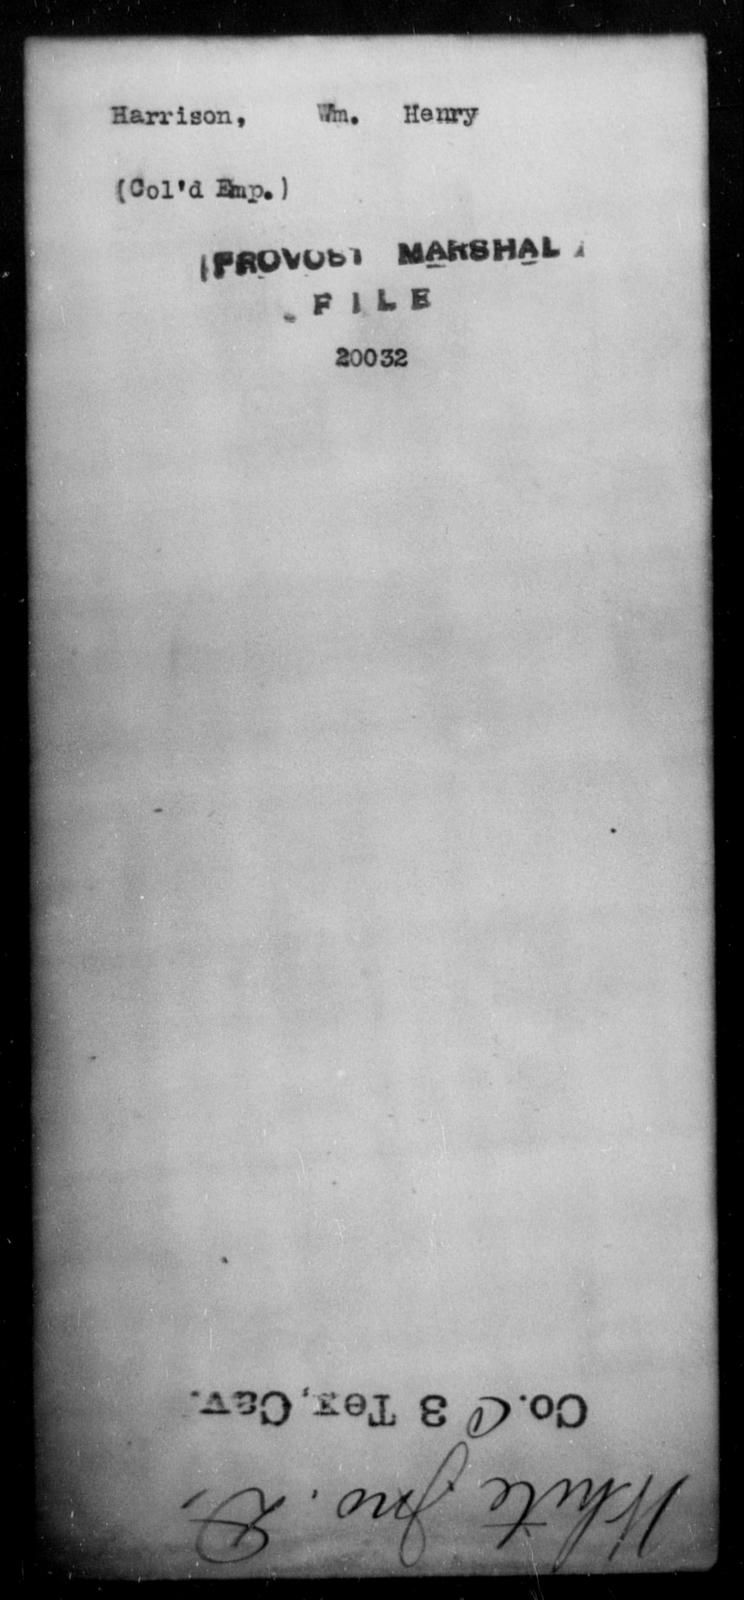 Harrison, Wm Henry - State: [Blank] - Year: [Blank]